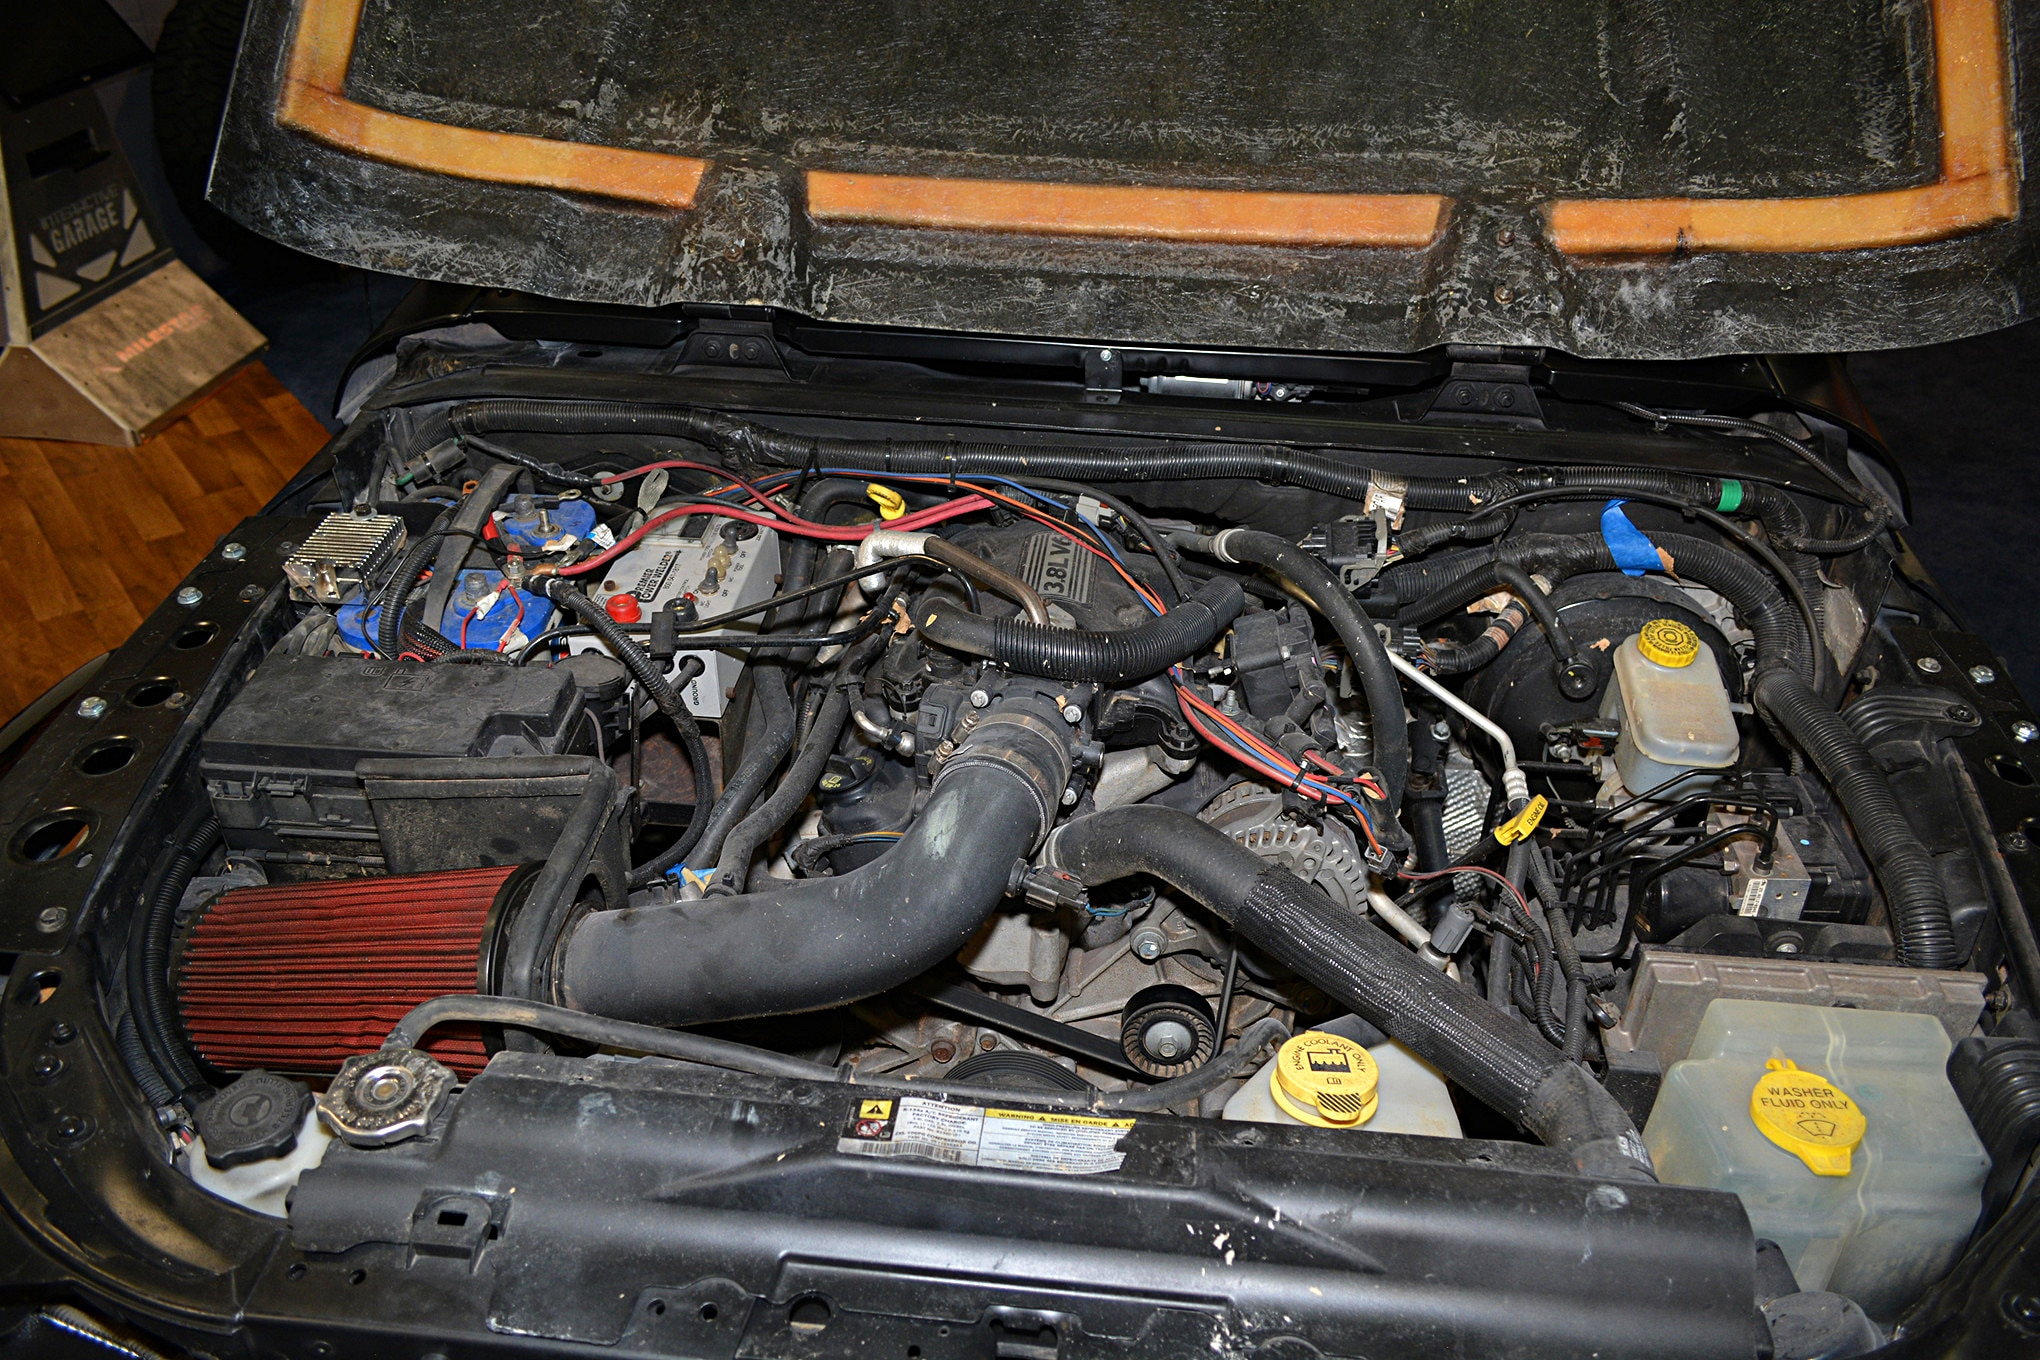 007 sema jeep mini feature retro wrangler engine.JPG